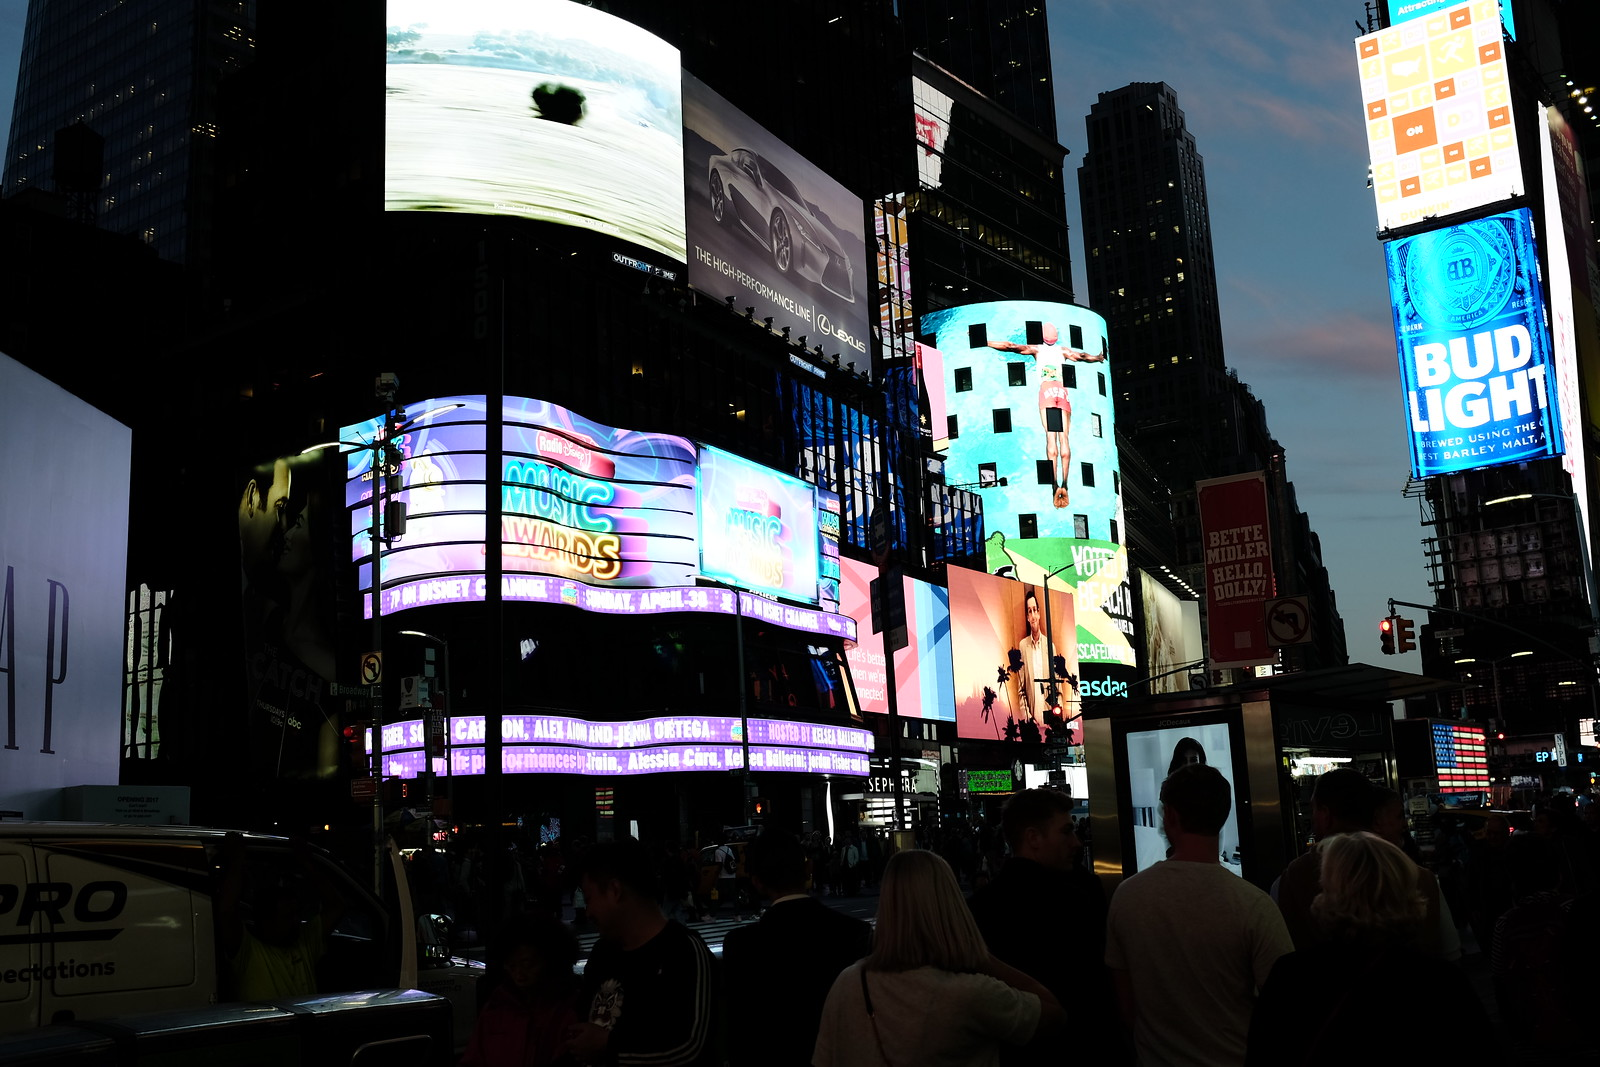 The New York Photo by FUJIFILM X100S.